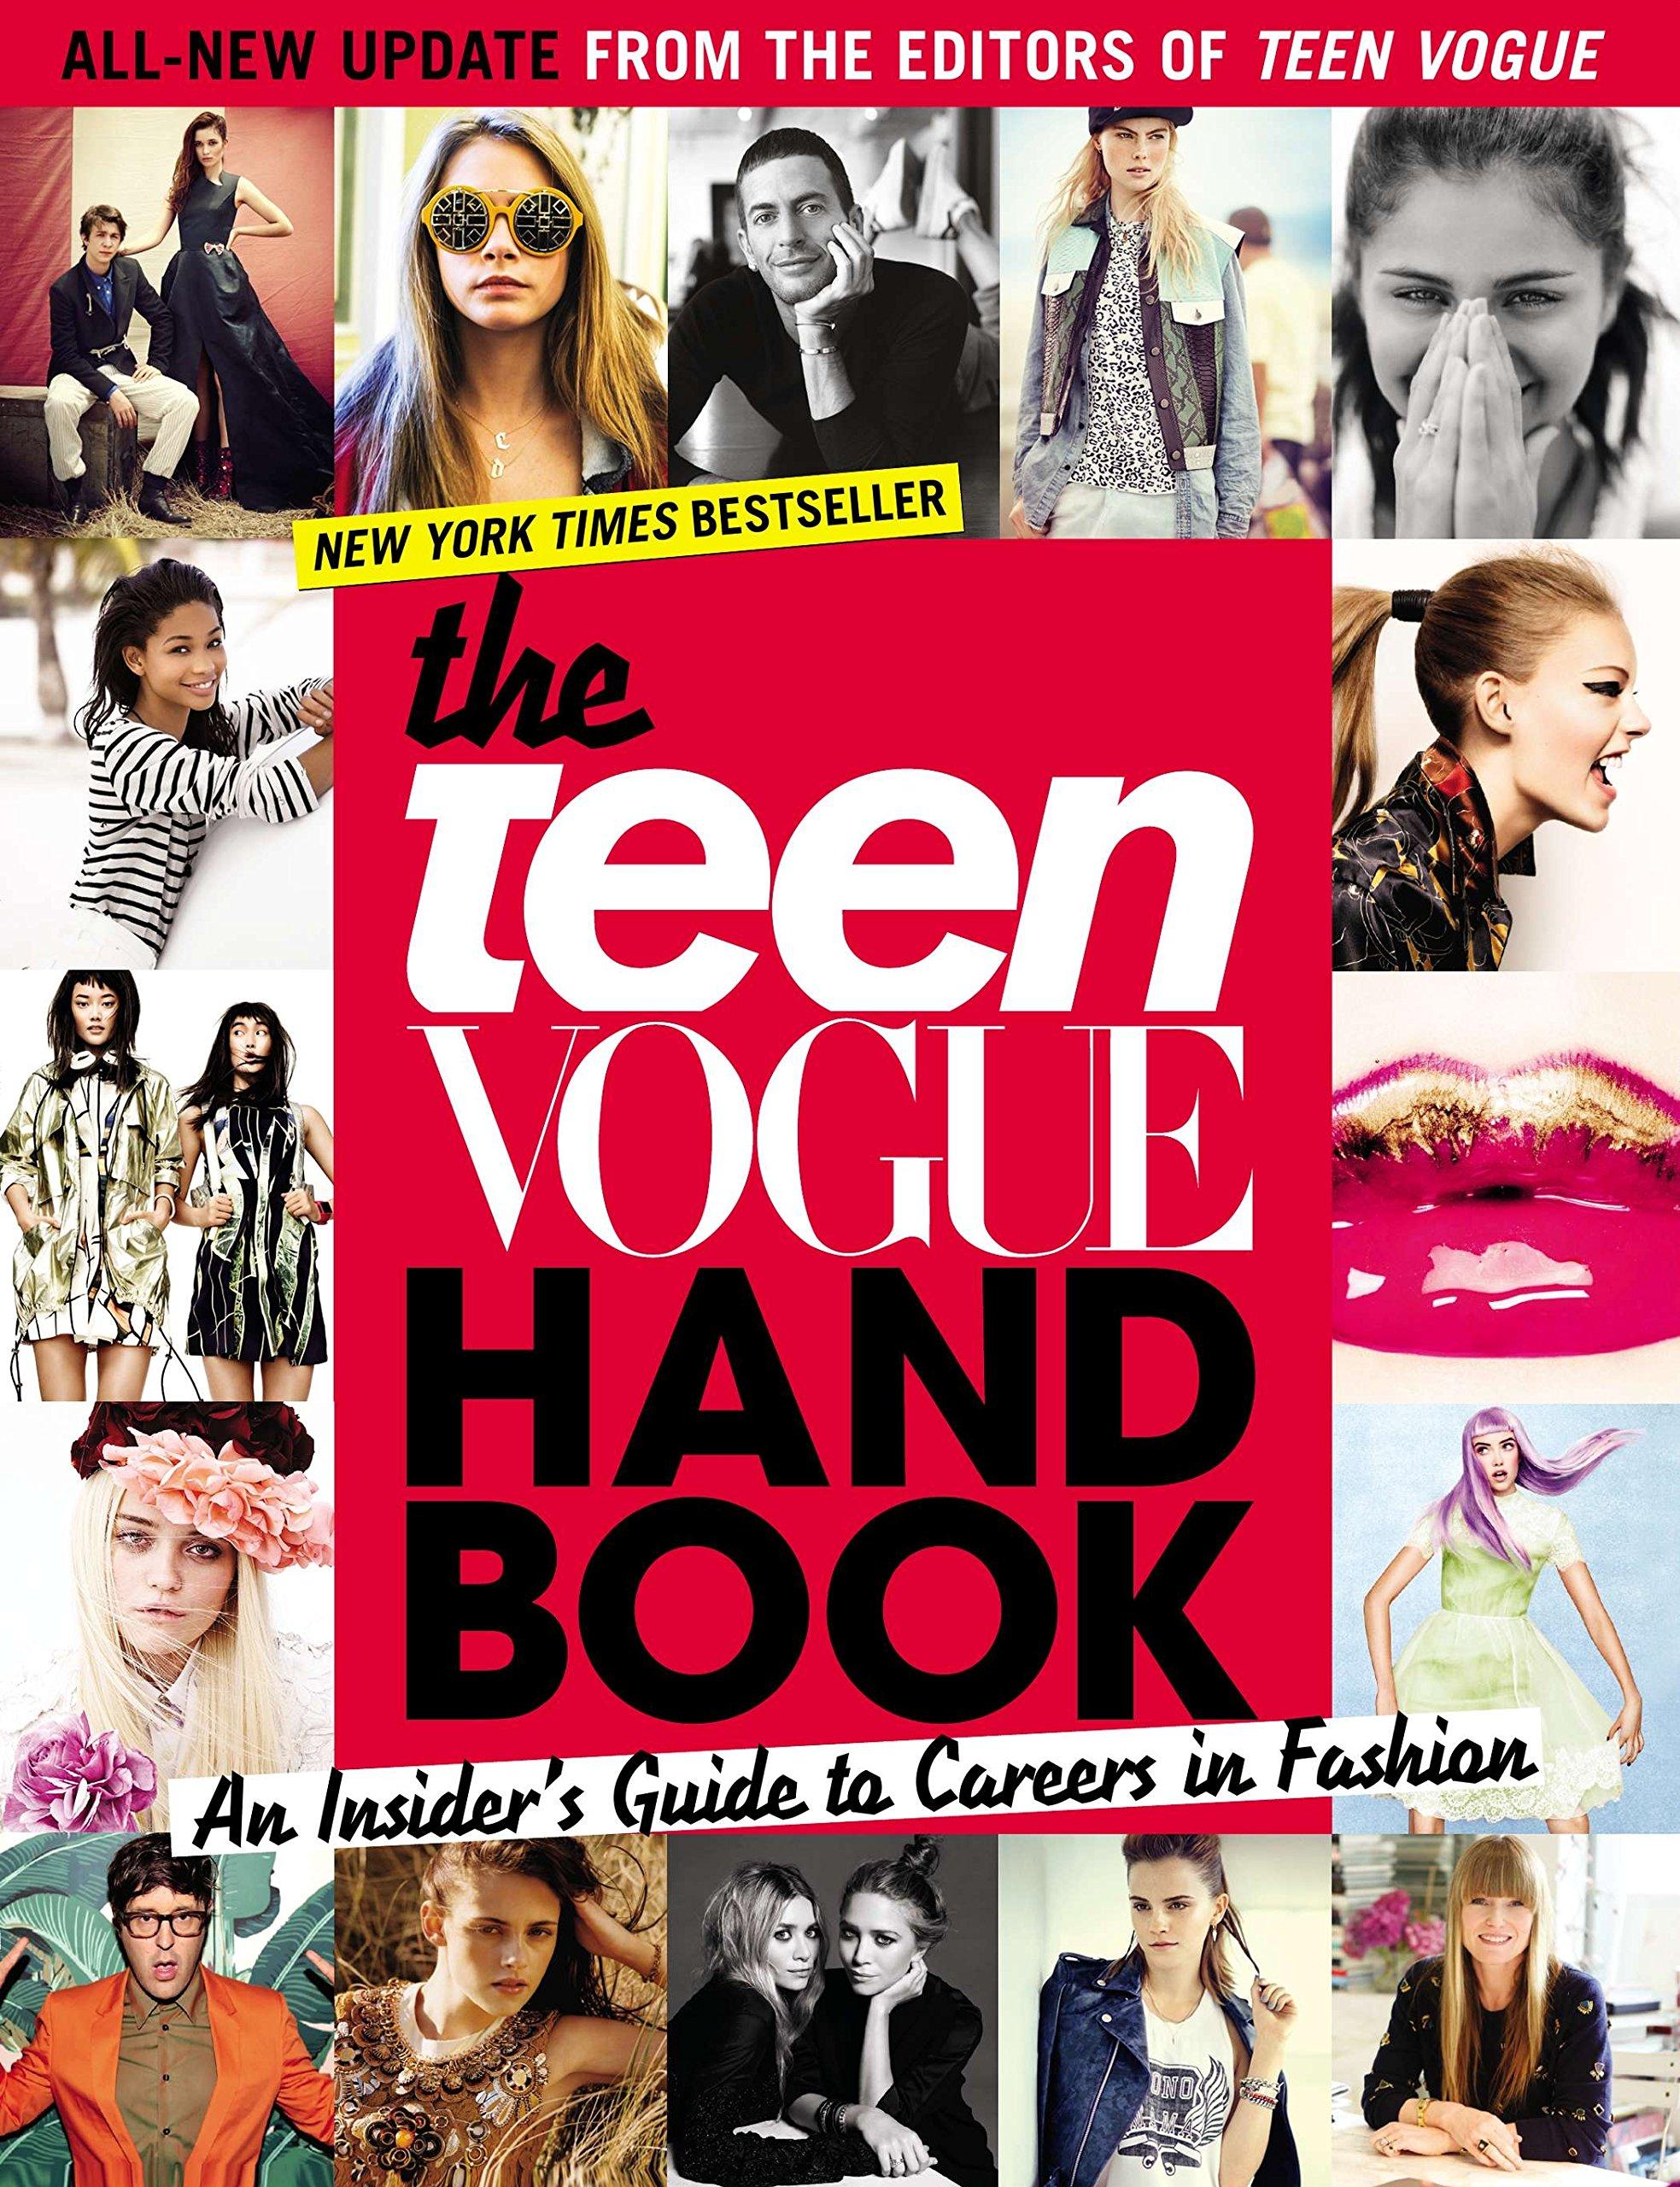 Teen vogue hand book amazon